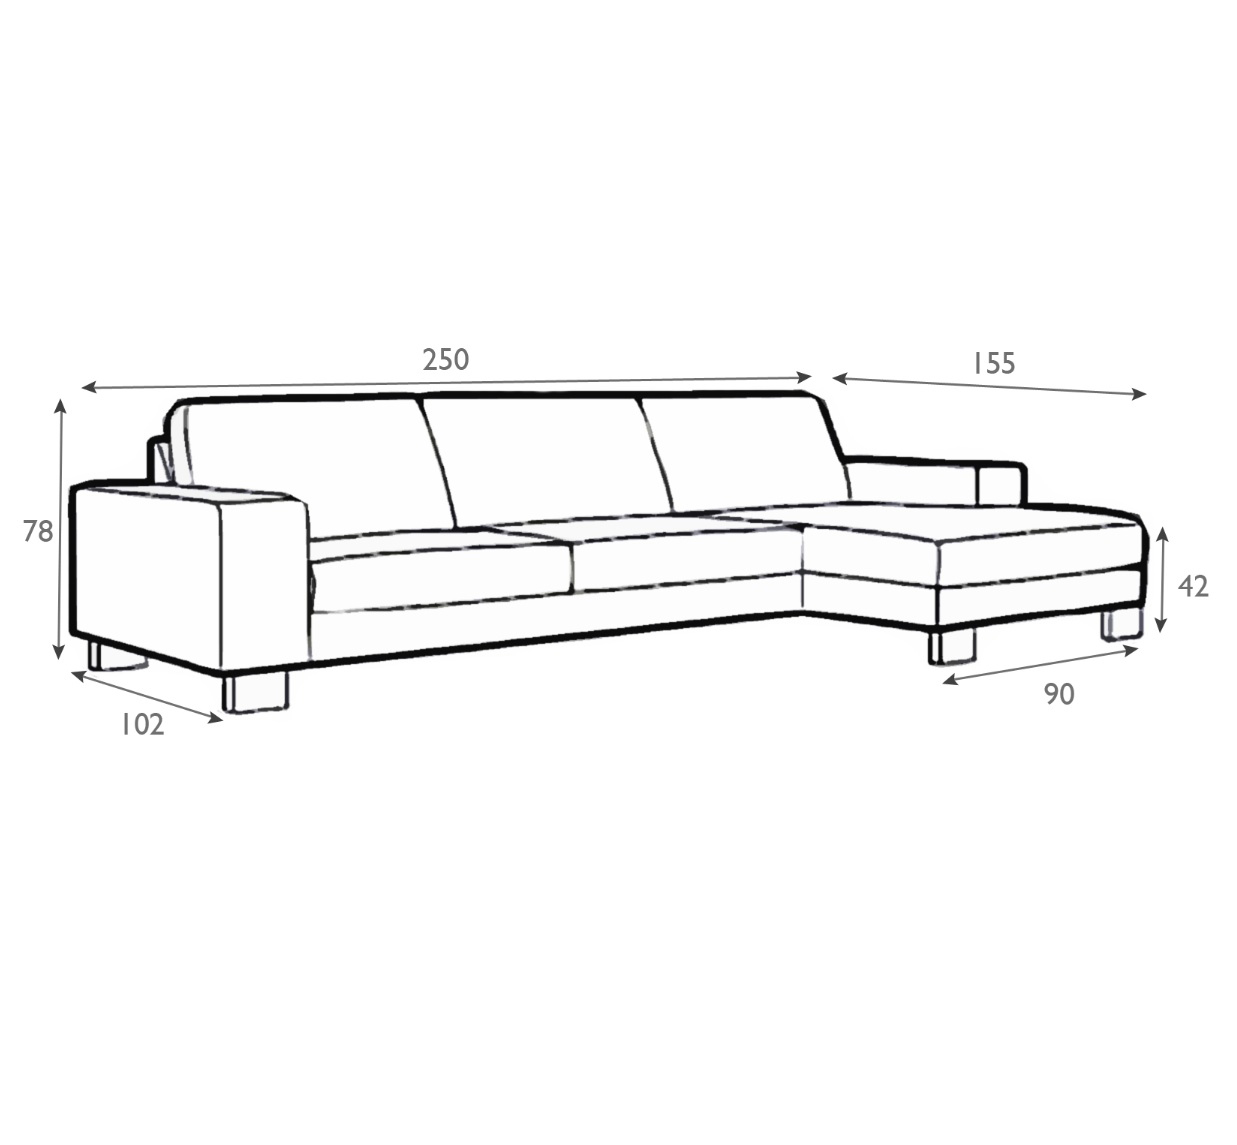 Lantana Italian Leather Set 1 Sofa With Chaiselongue-0